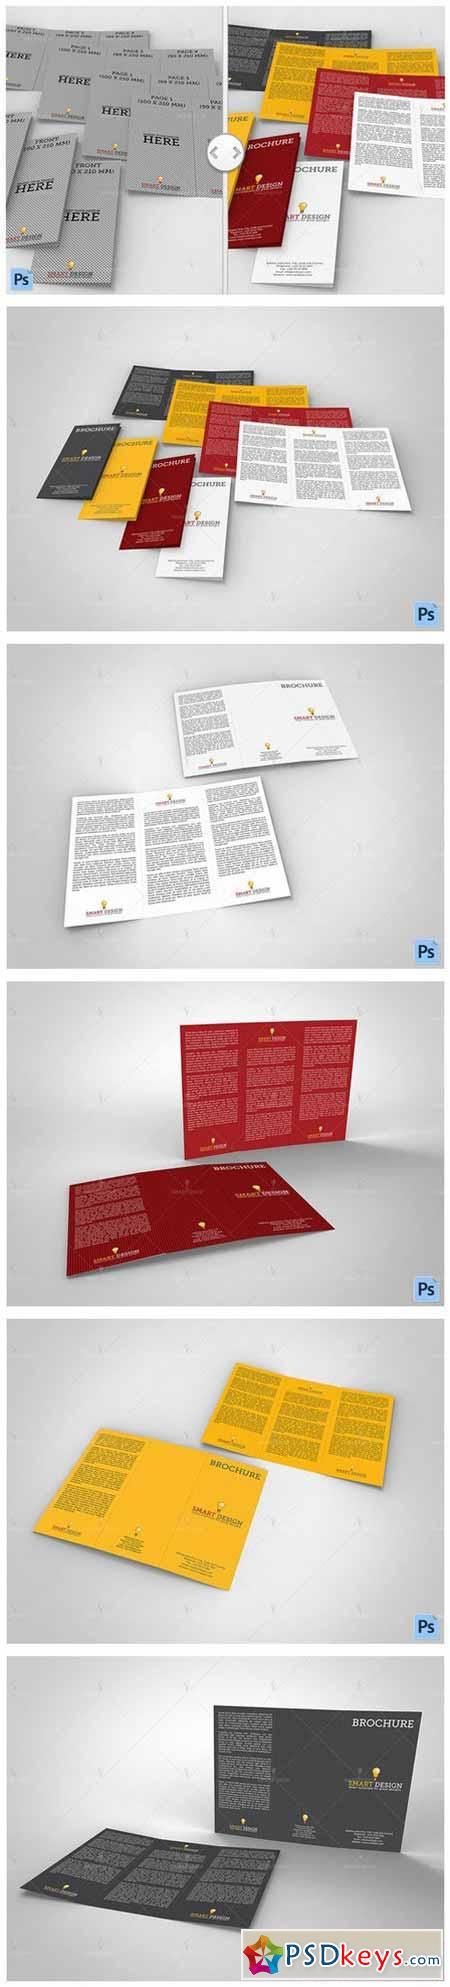 Brochure Trifold Mockup 580182